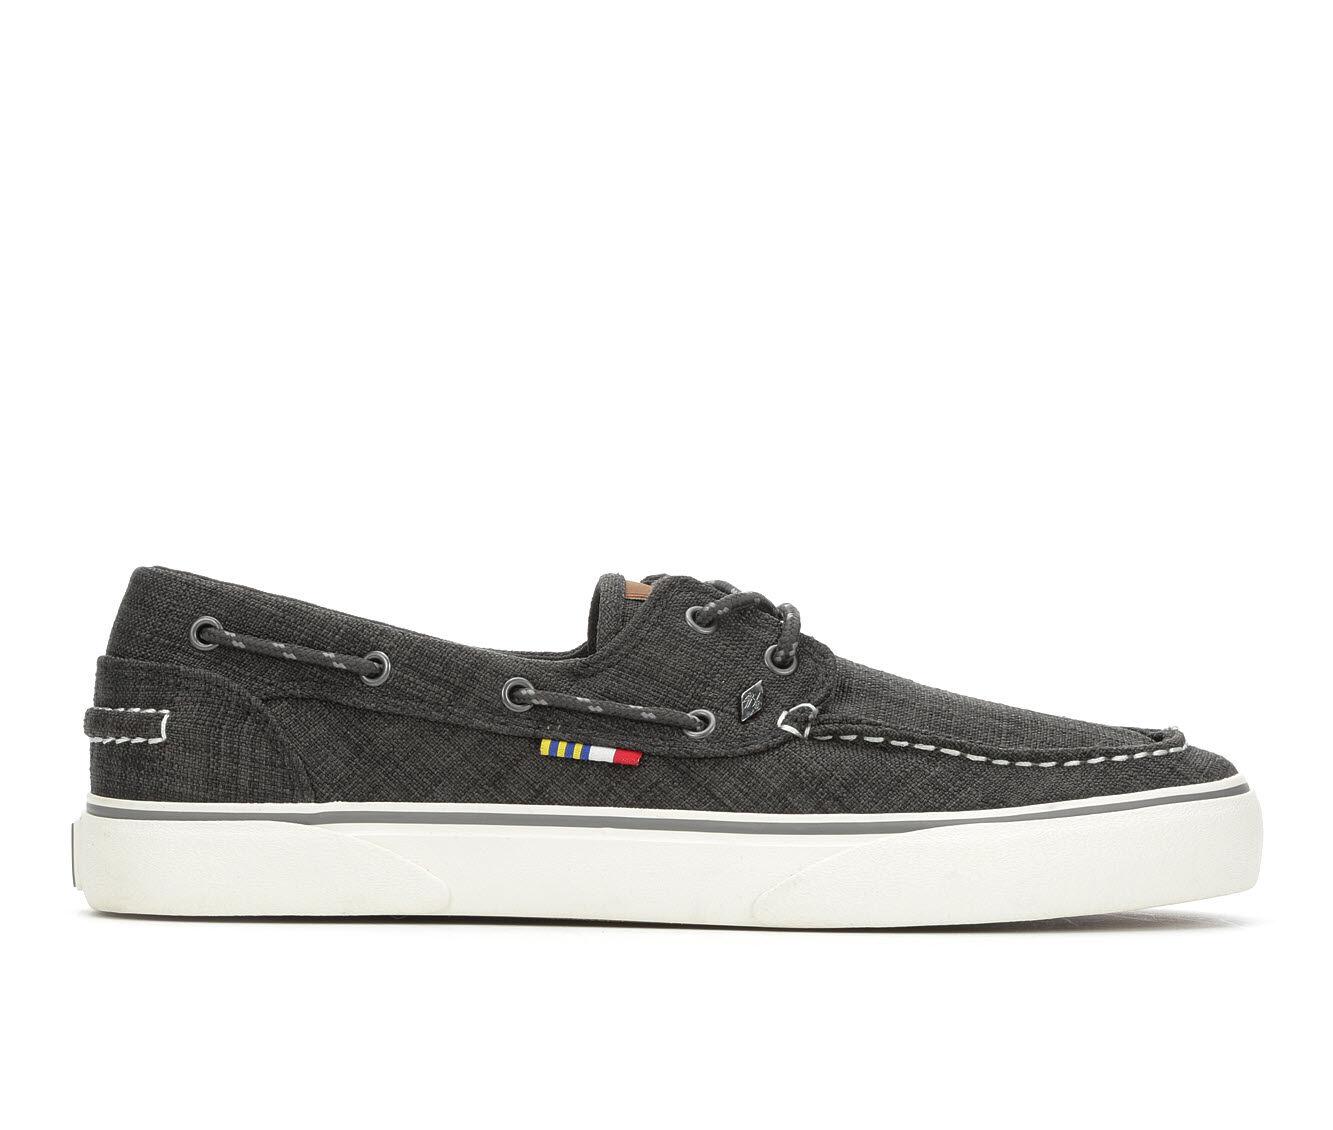 Men's Guy Harvey Gulf Linen Casual Shoes Black/Grey